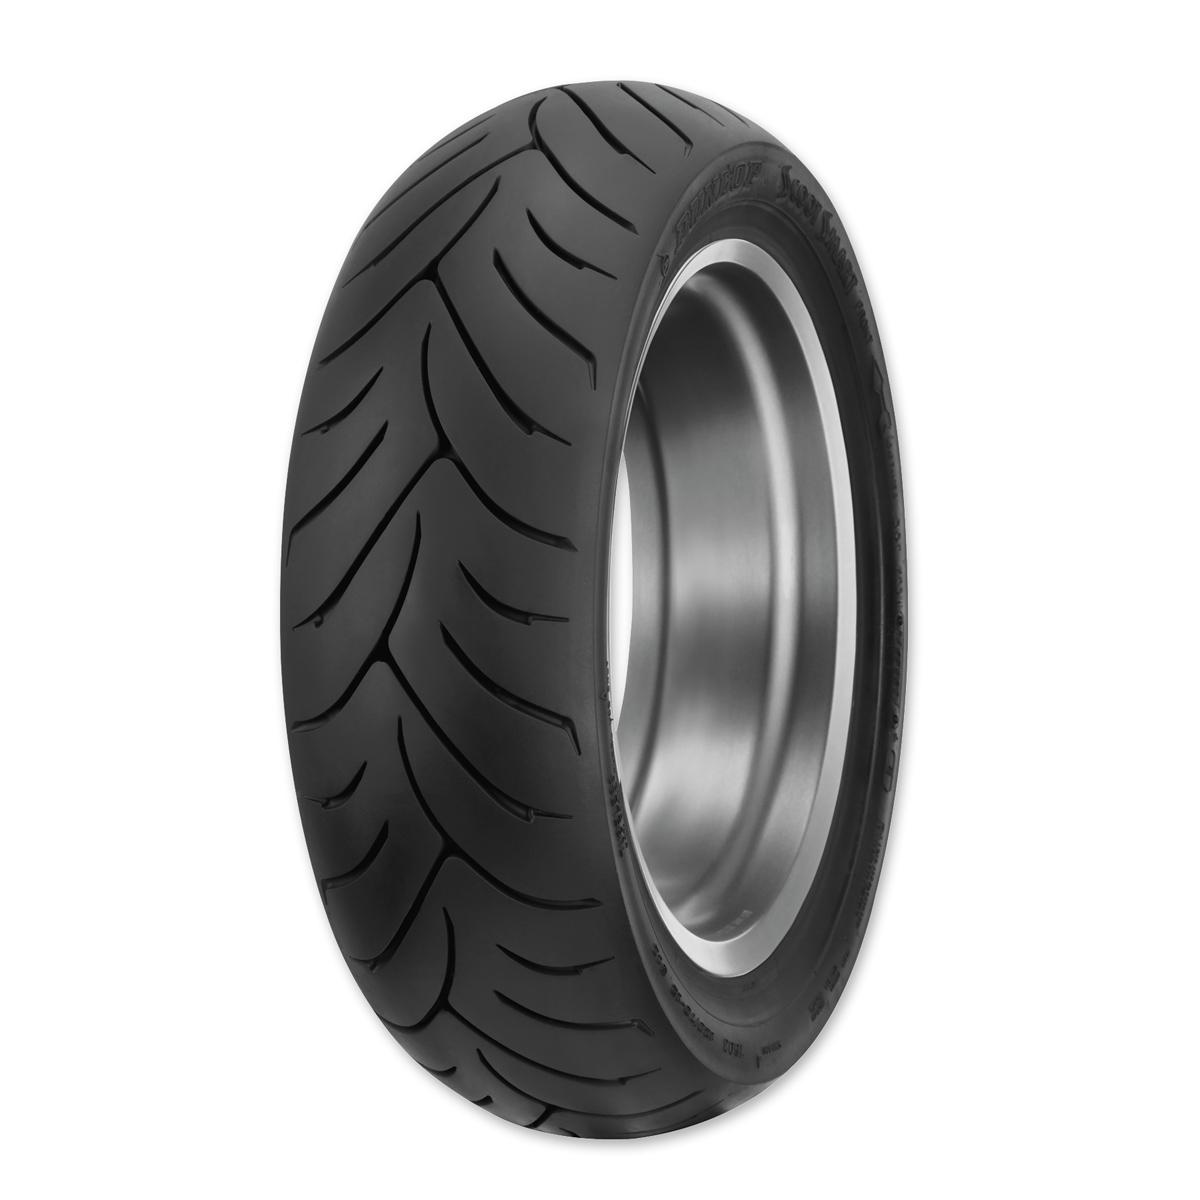 Dunlop Scootsmart 120/70-13  Front Tire